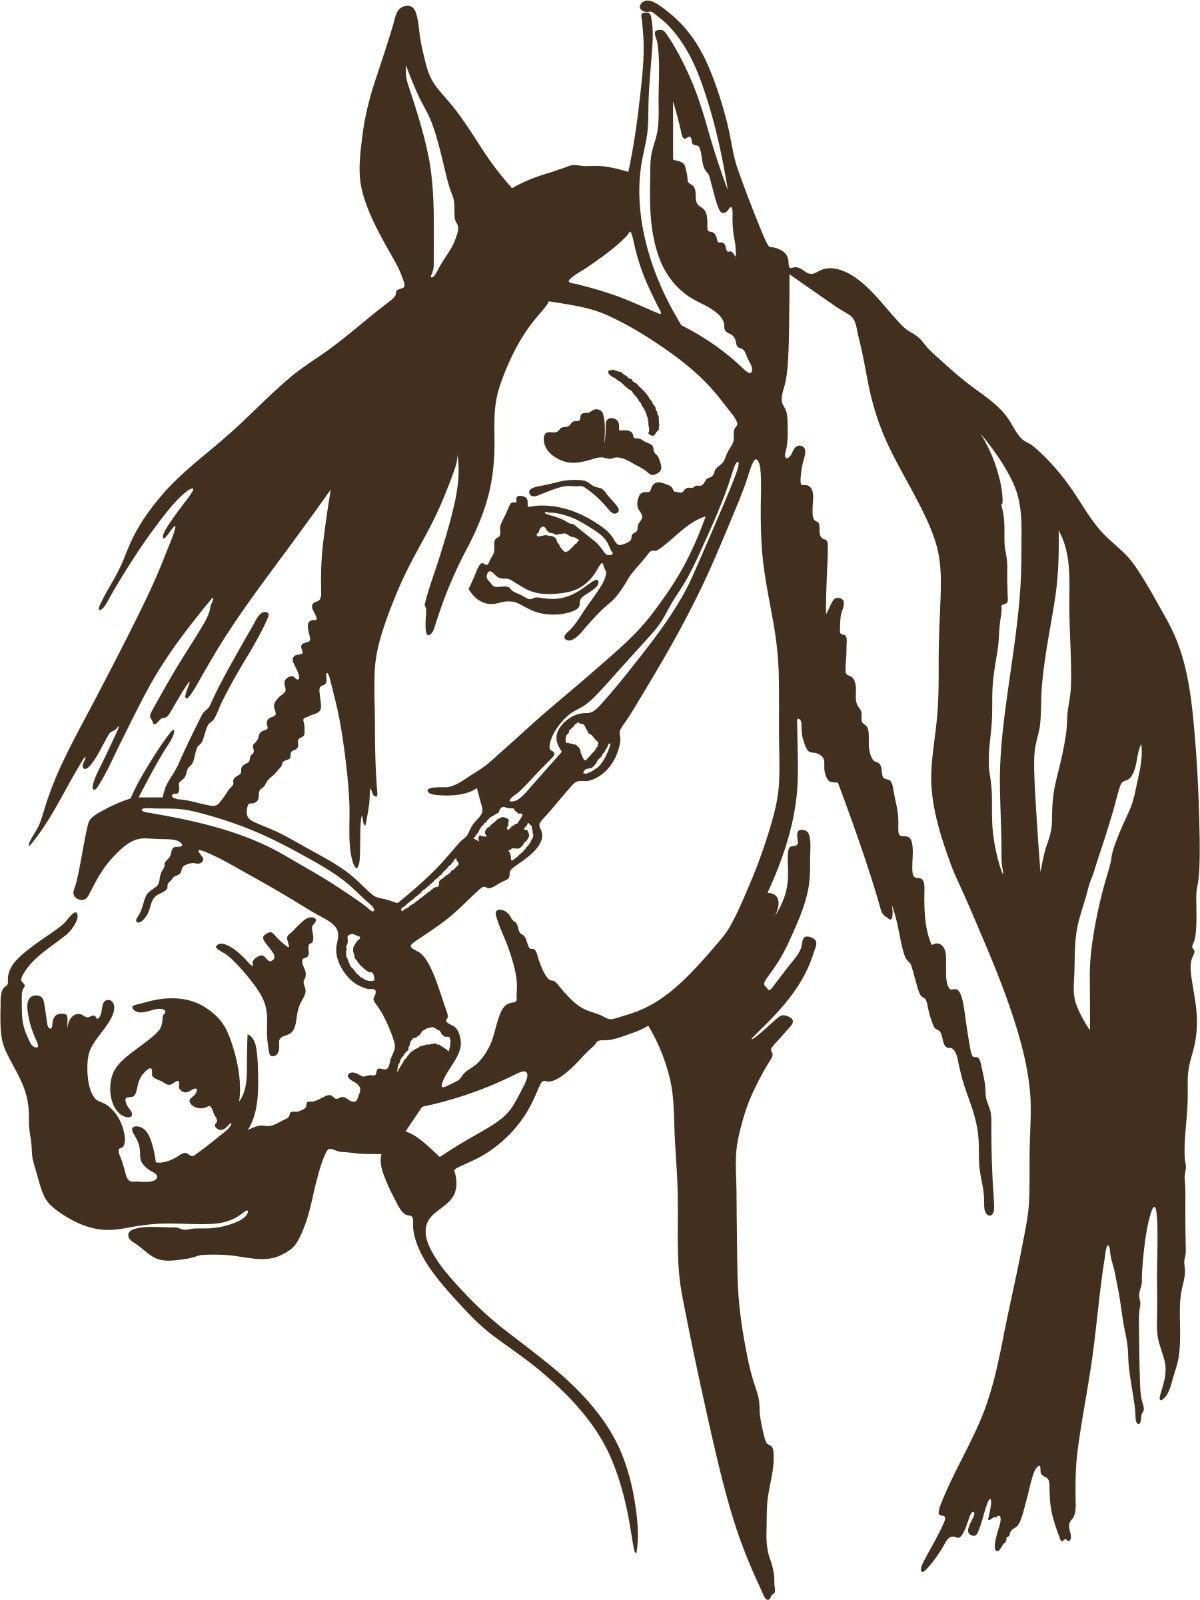 For Horse Head Cowboy Pet Rodeo Western Car Truck Trailer Window Vinyl Decal Sticker Car Styling